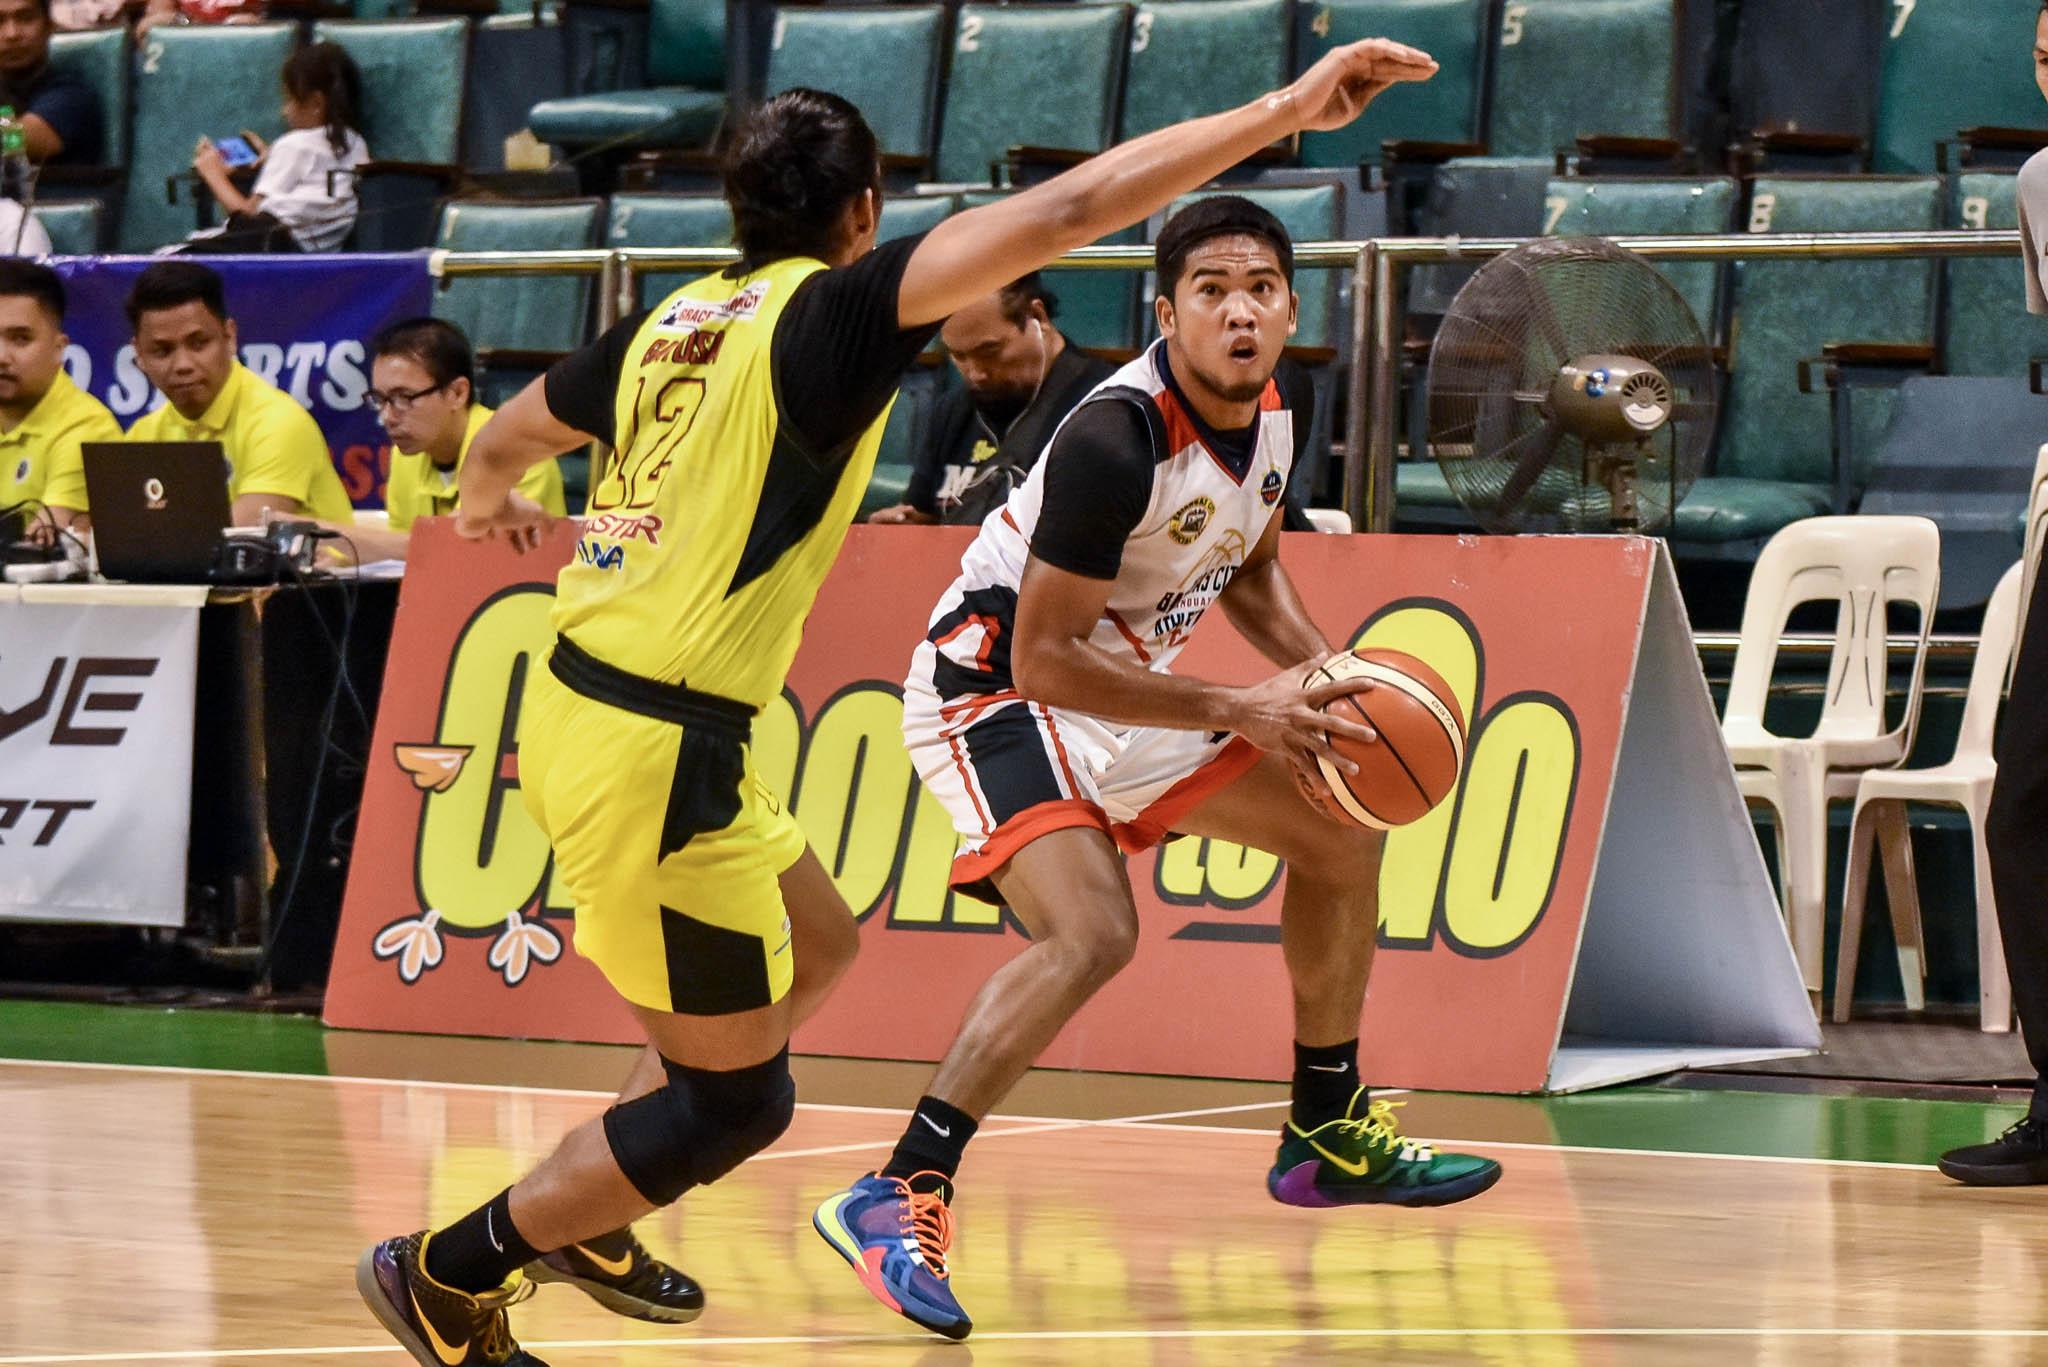 Tiebreaker Times Genmar Bragais on breakout performance for Batangas: 'Pati ako nagulat' Basketball MPBL News  Woody Co Genmar Bragais Batangas City-Tanduay Athletics 2019-20 MPBL Lakan Cup